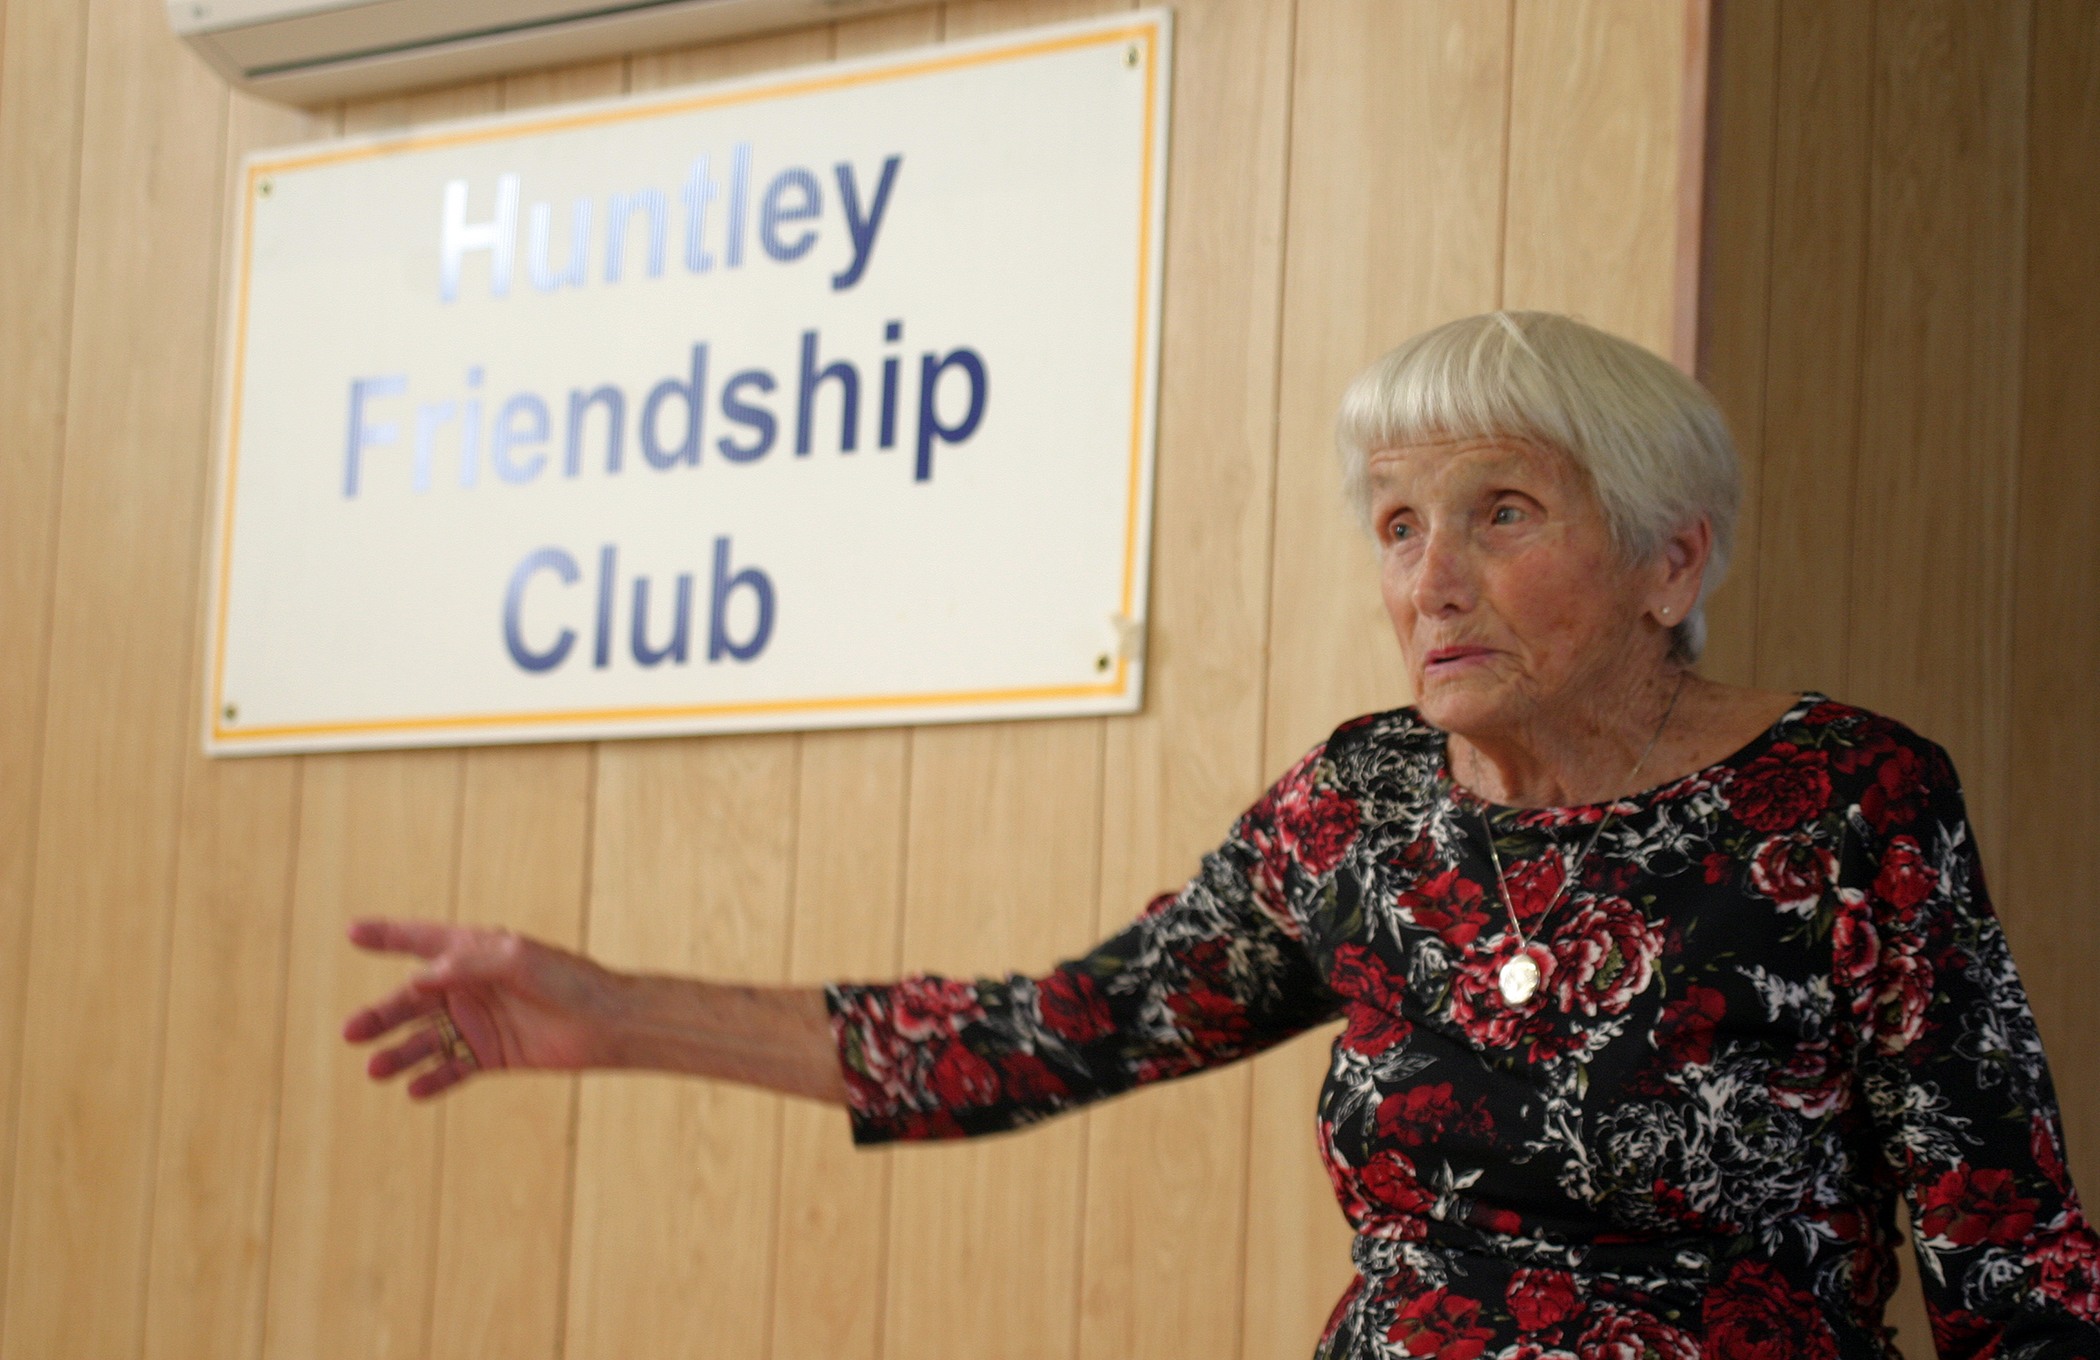 Huntley Friendship Club hosts 'the Boss'